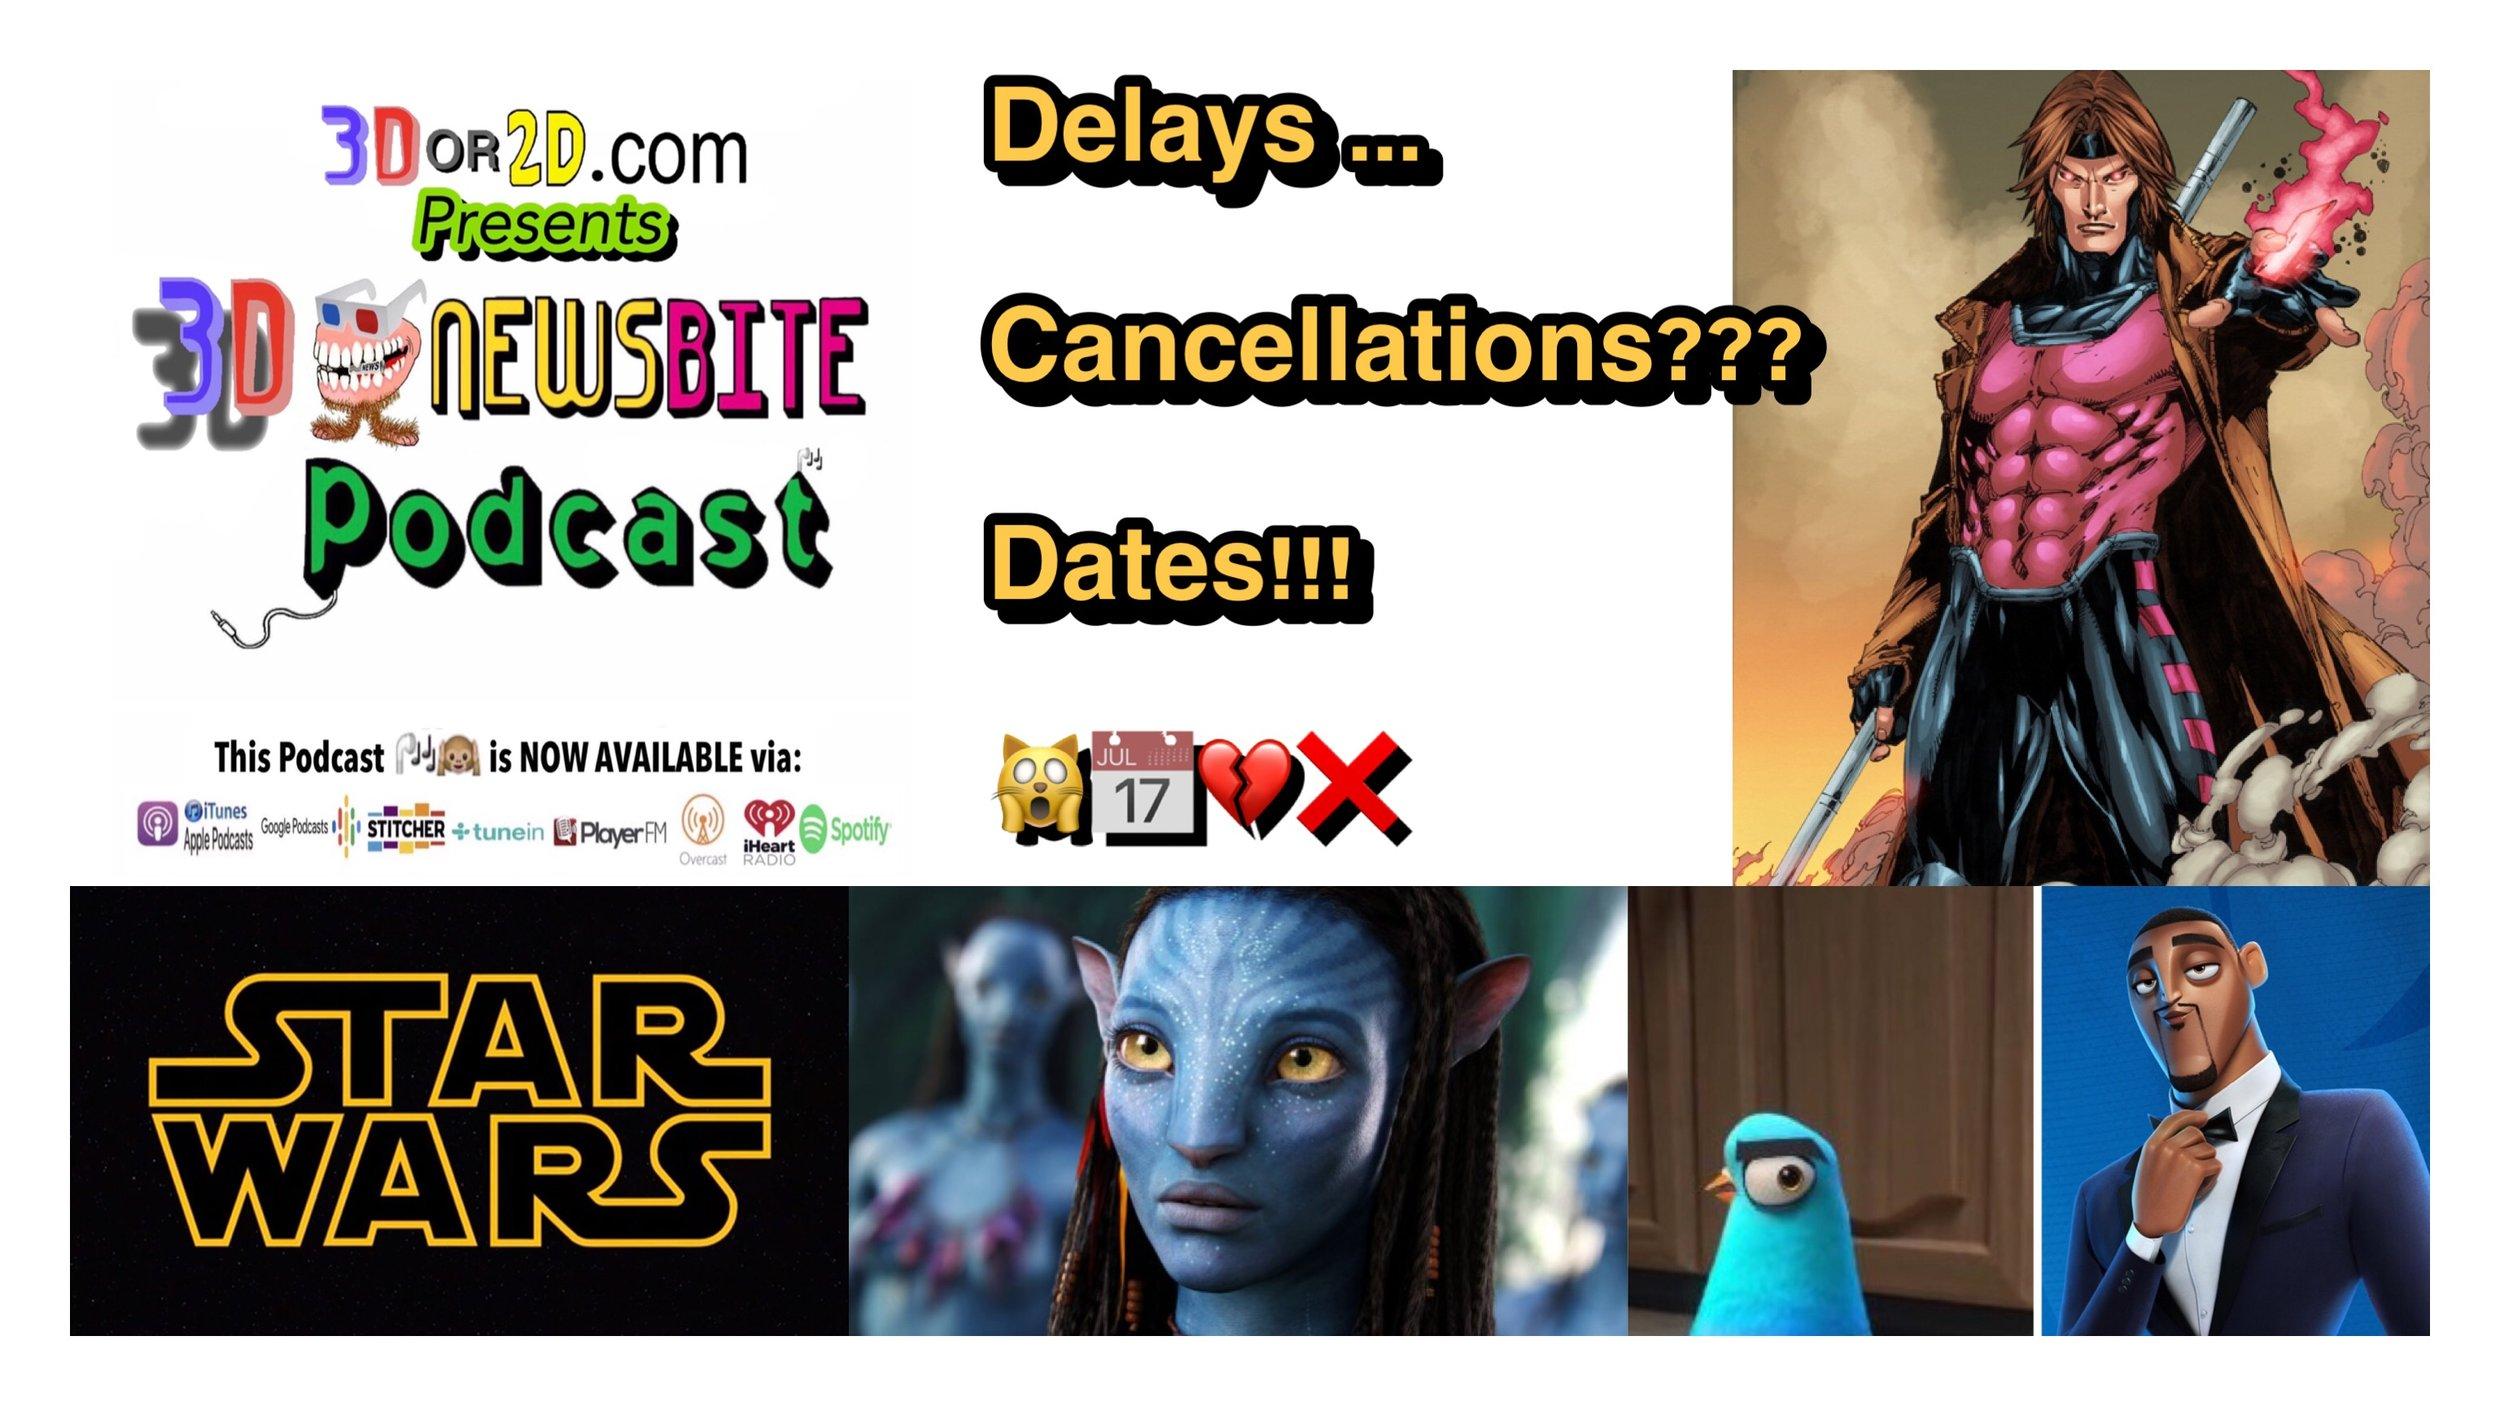 3d-newsbite-podcast-delays.JPG